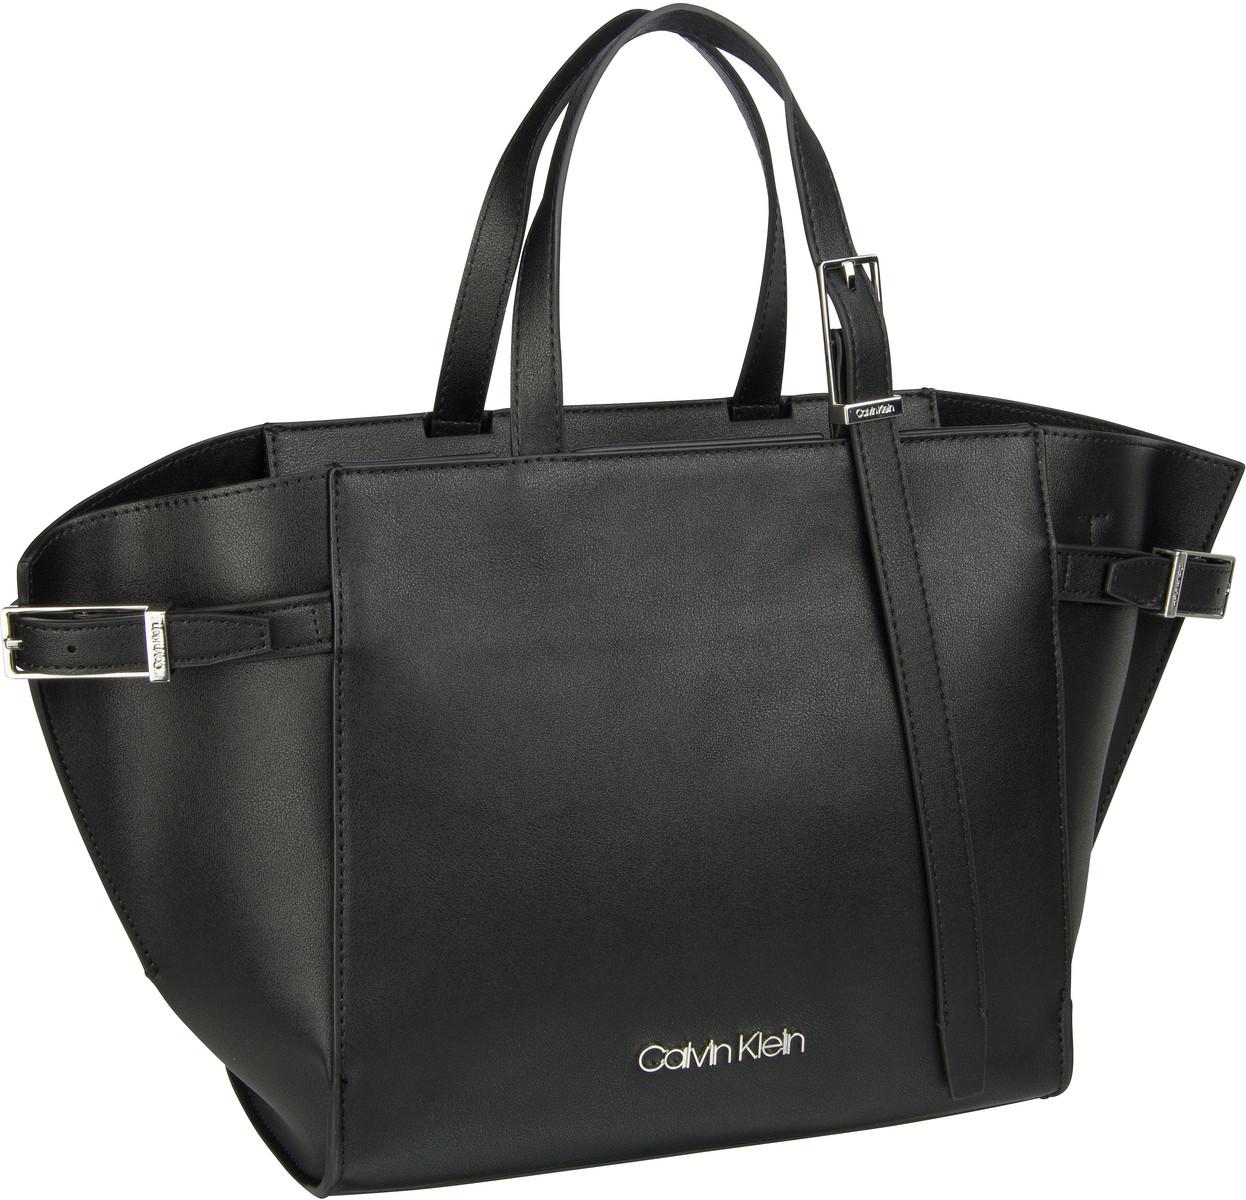 Handtasche Extended Tote Black